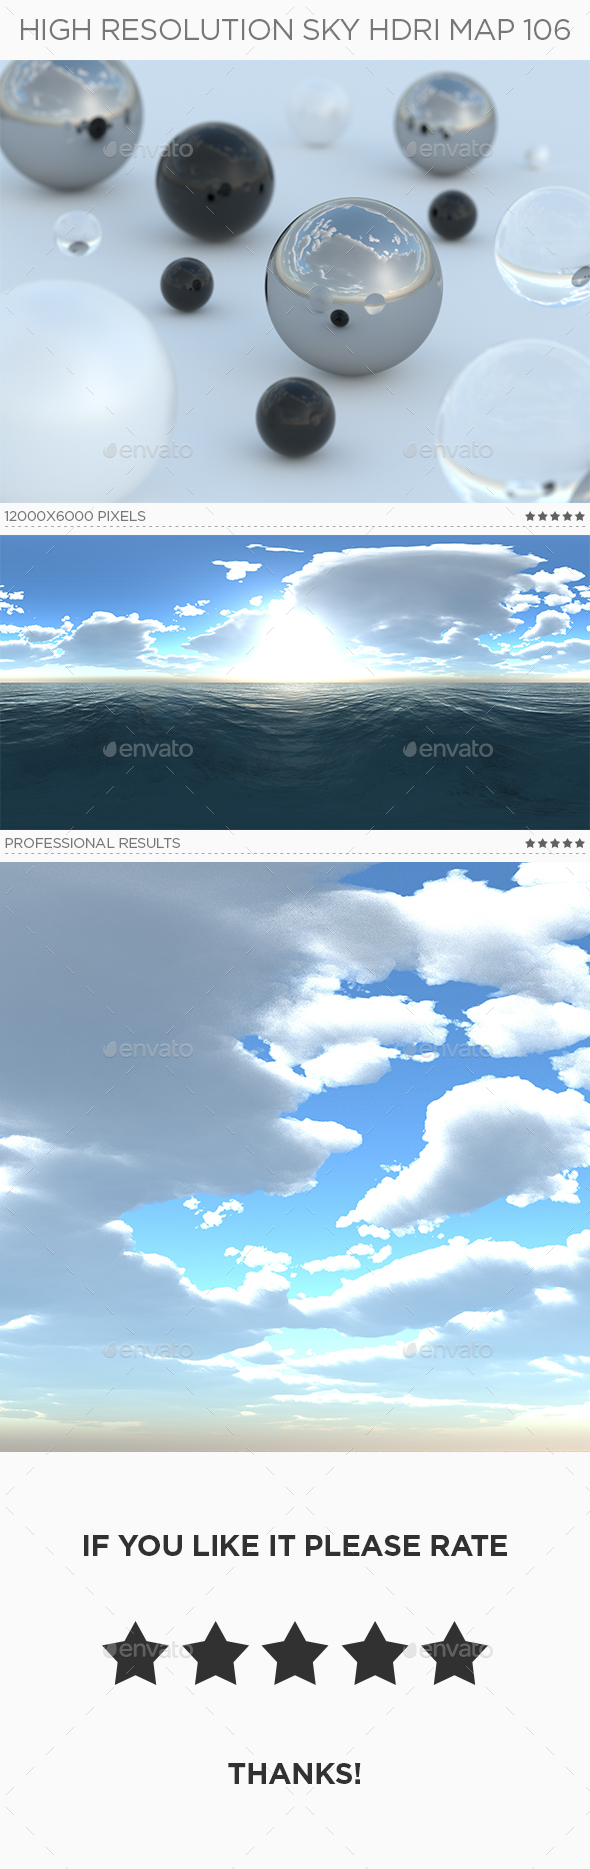 3DOcean High Resolution Sky HDRi Map 106 20391735